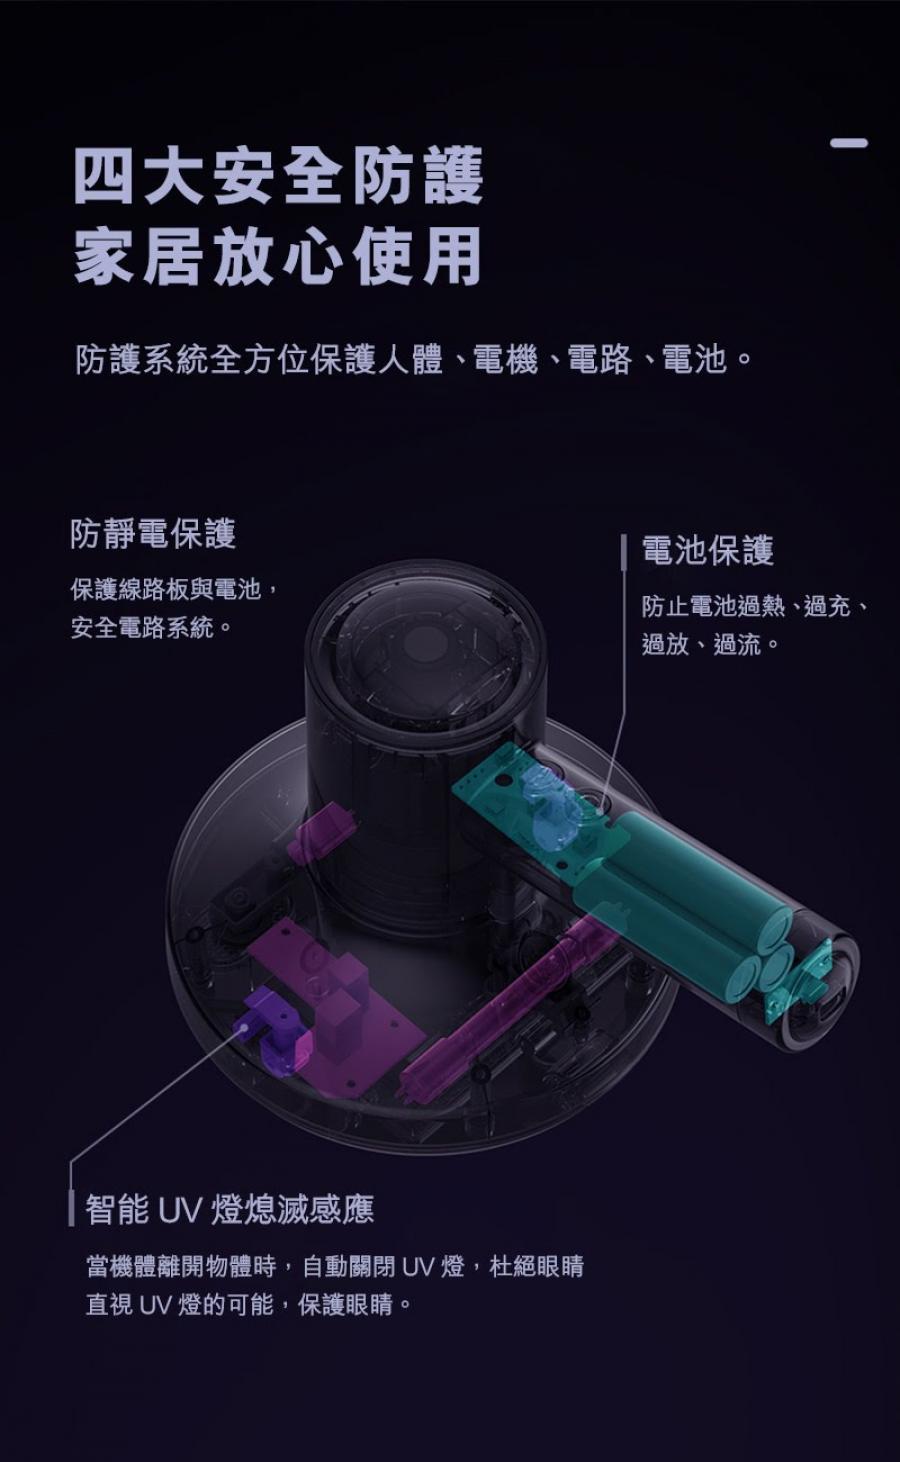 DAEWOO-V1-無線除蟎吸塵器